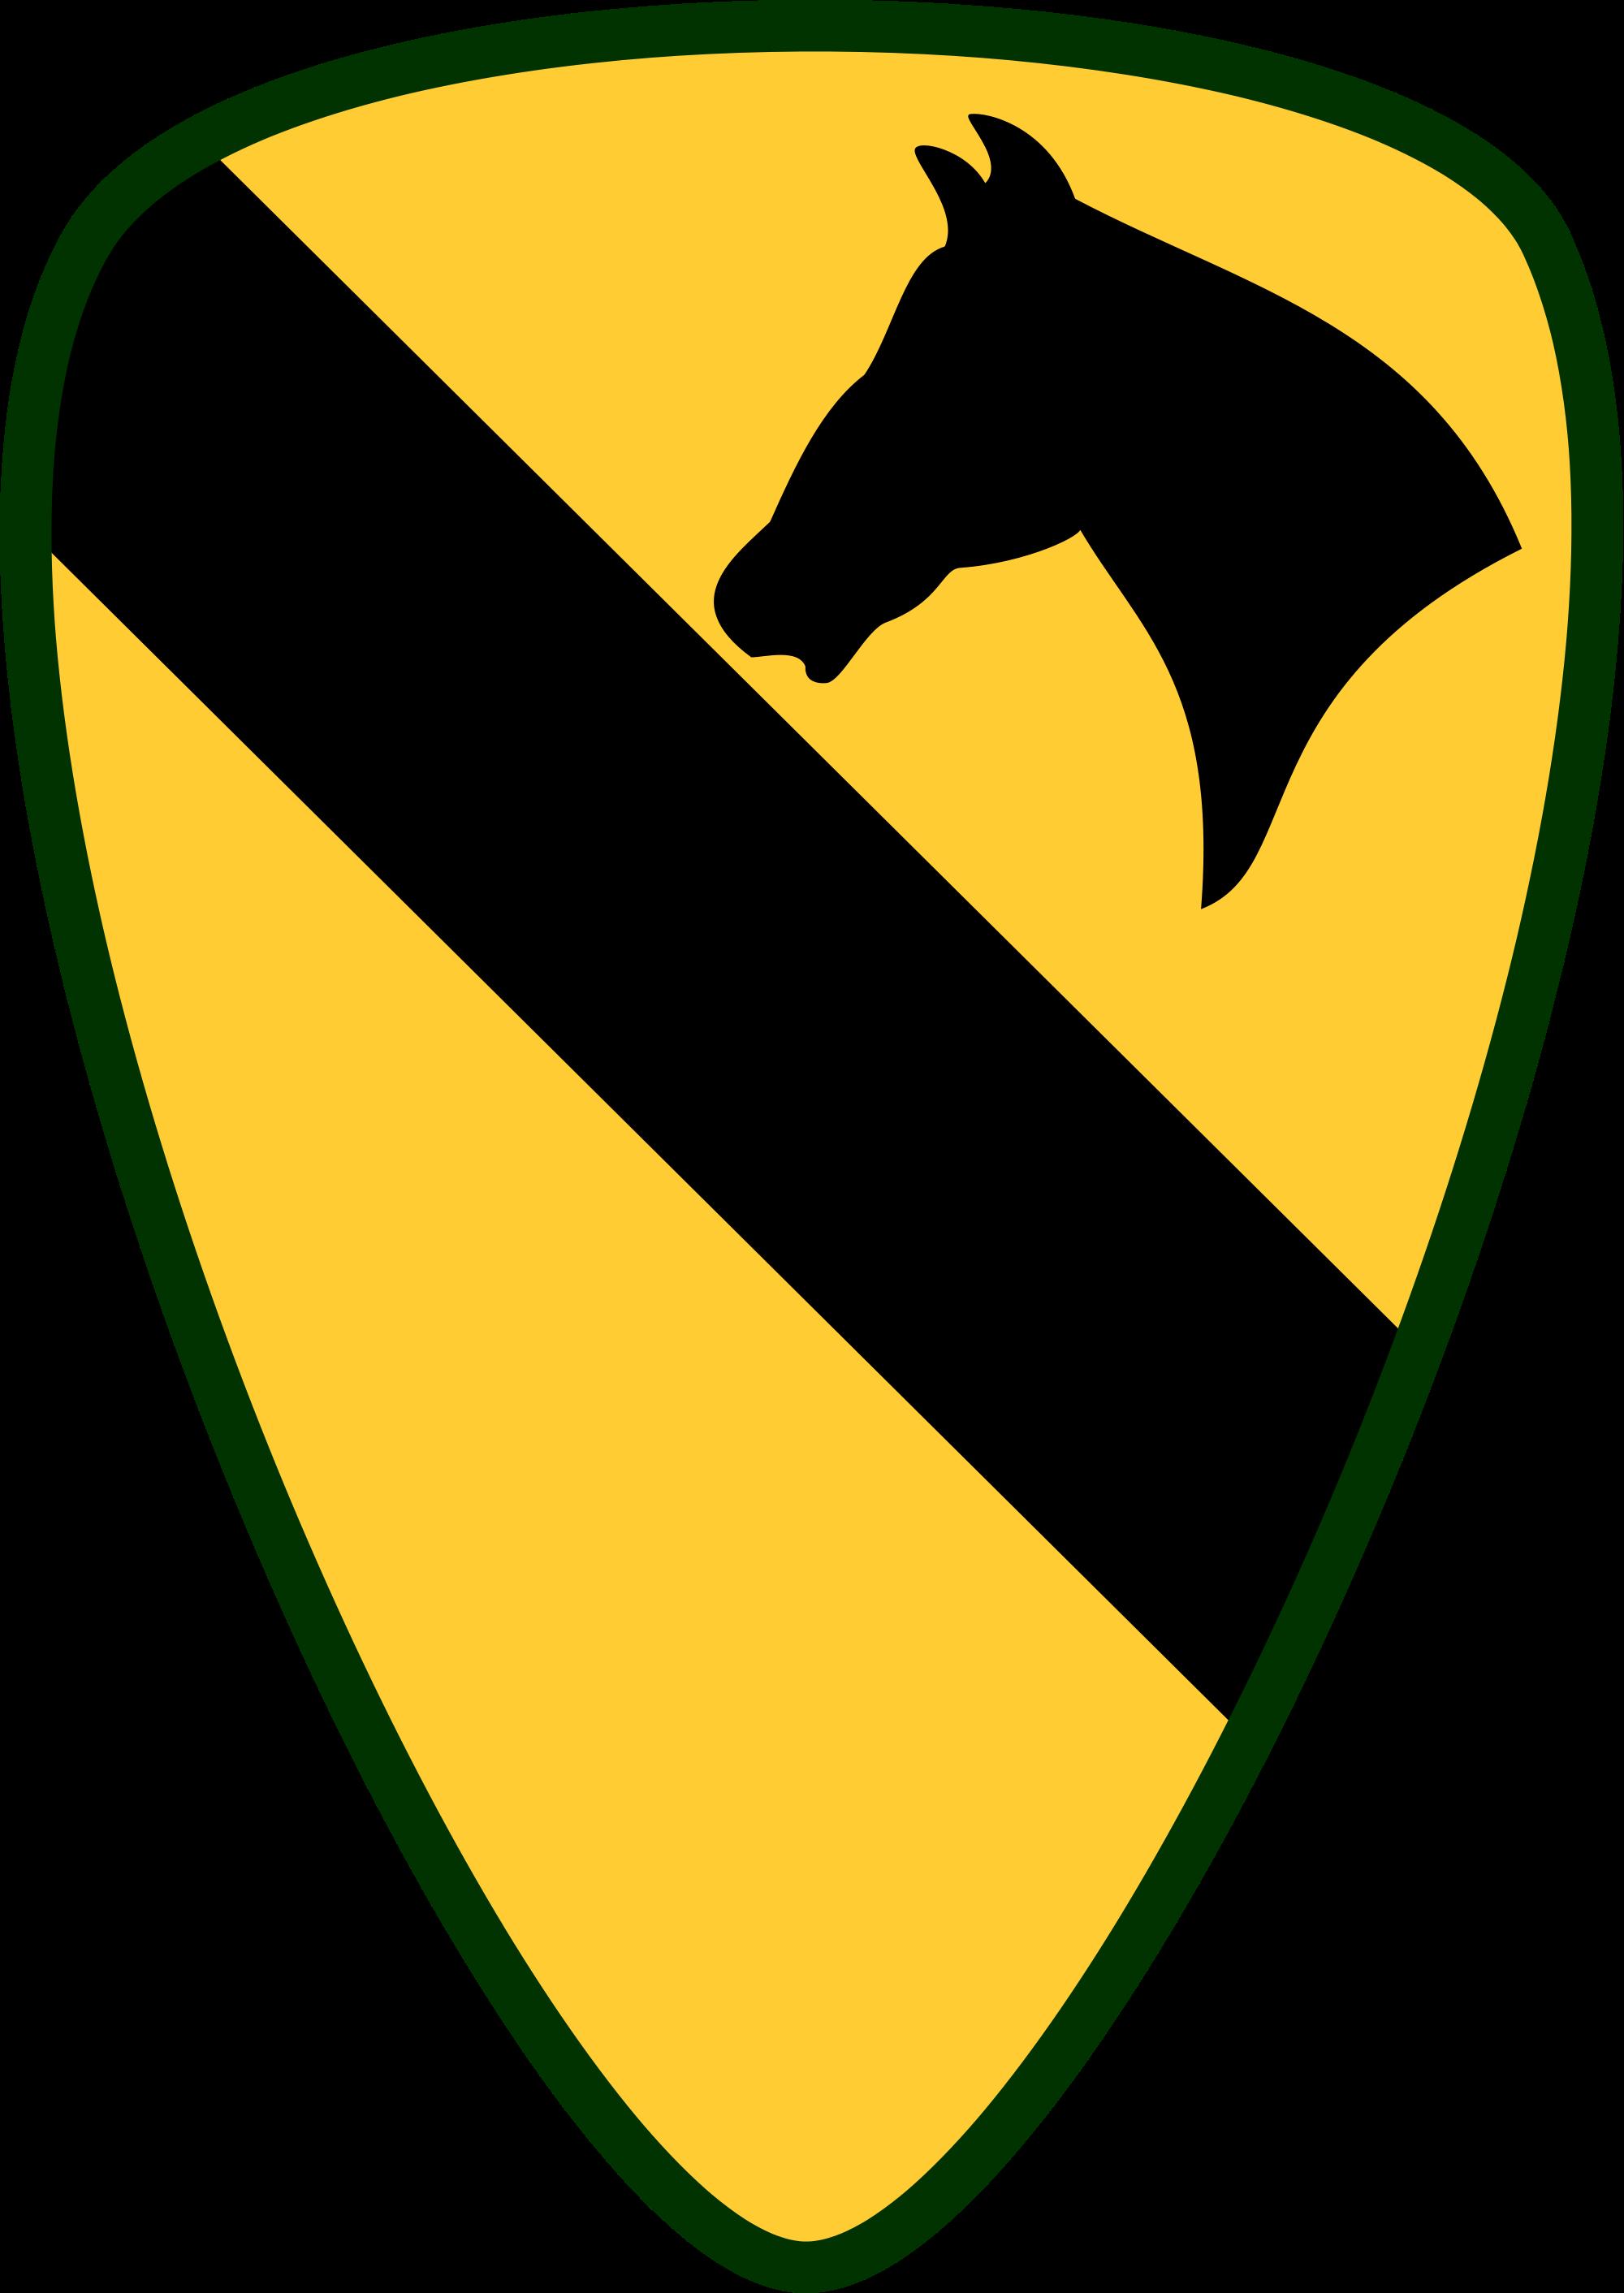 knight clipart cavalry